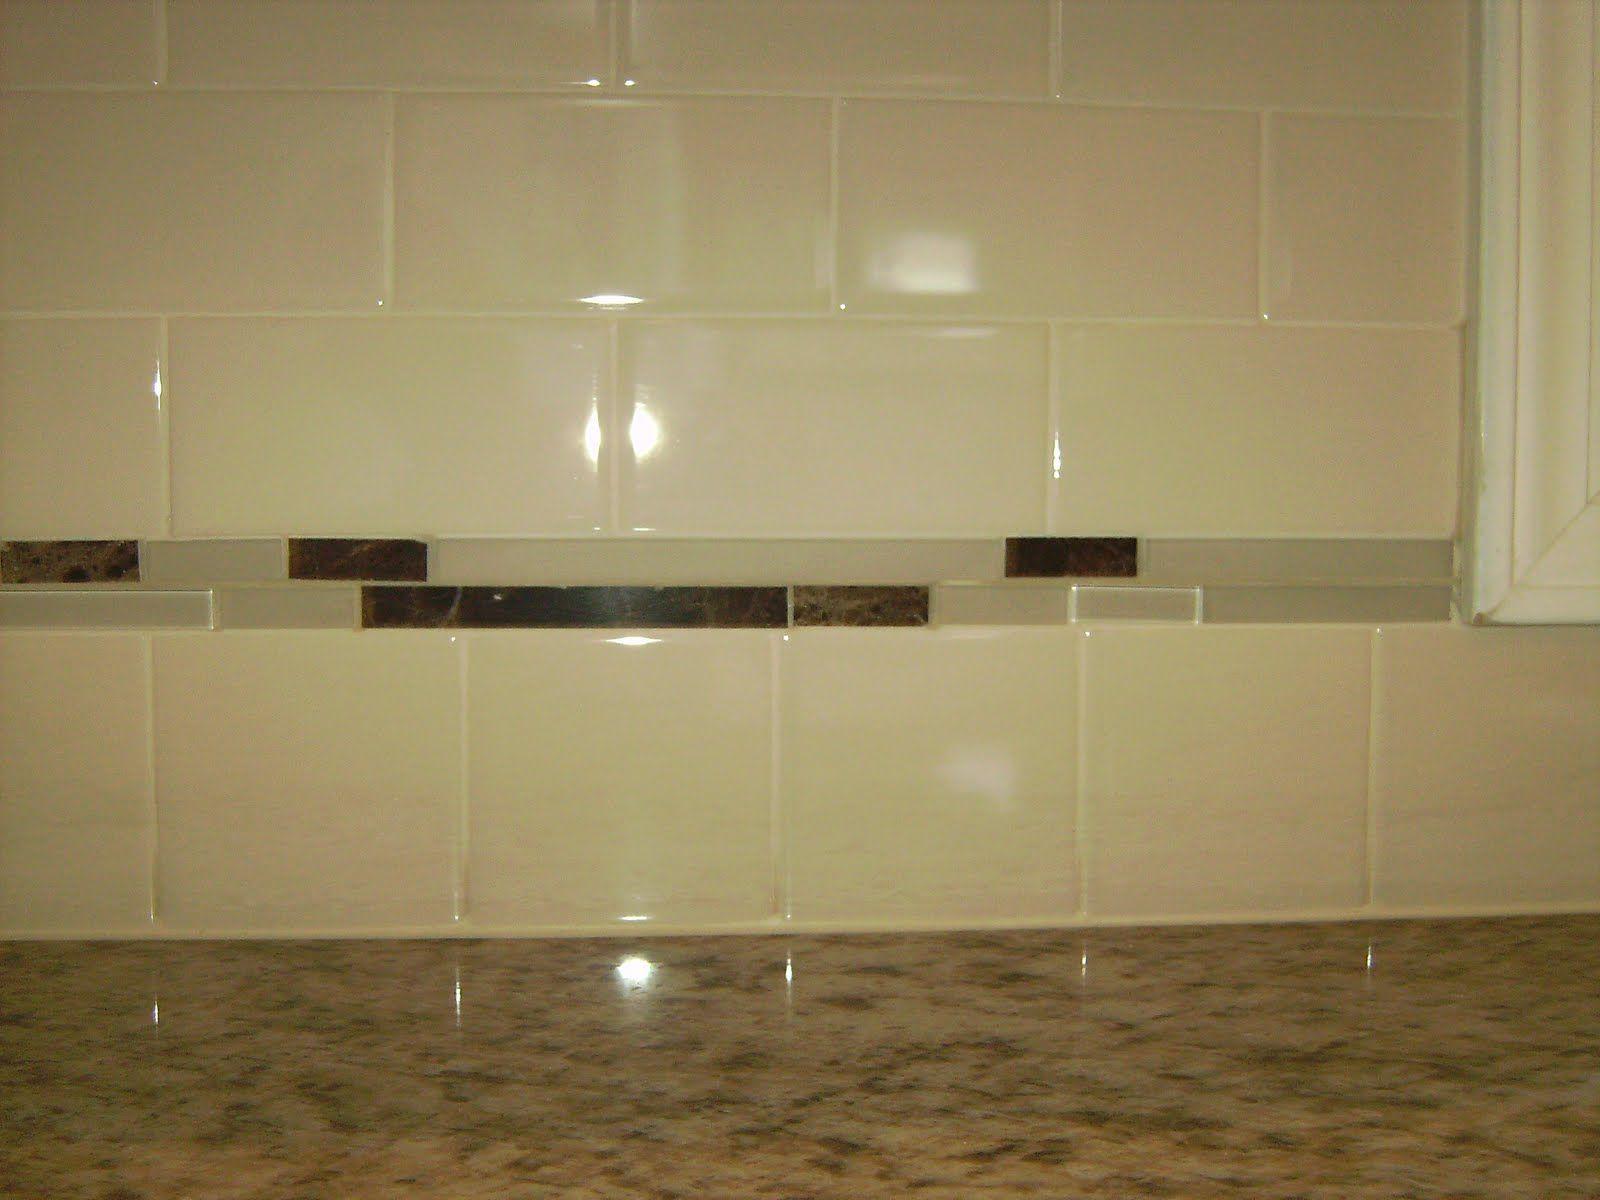 17 best images about backsplash ideas on pinterest kitchen backsplash black quartz and glass subway tile